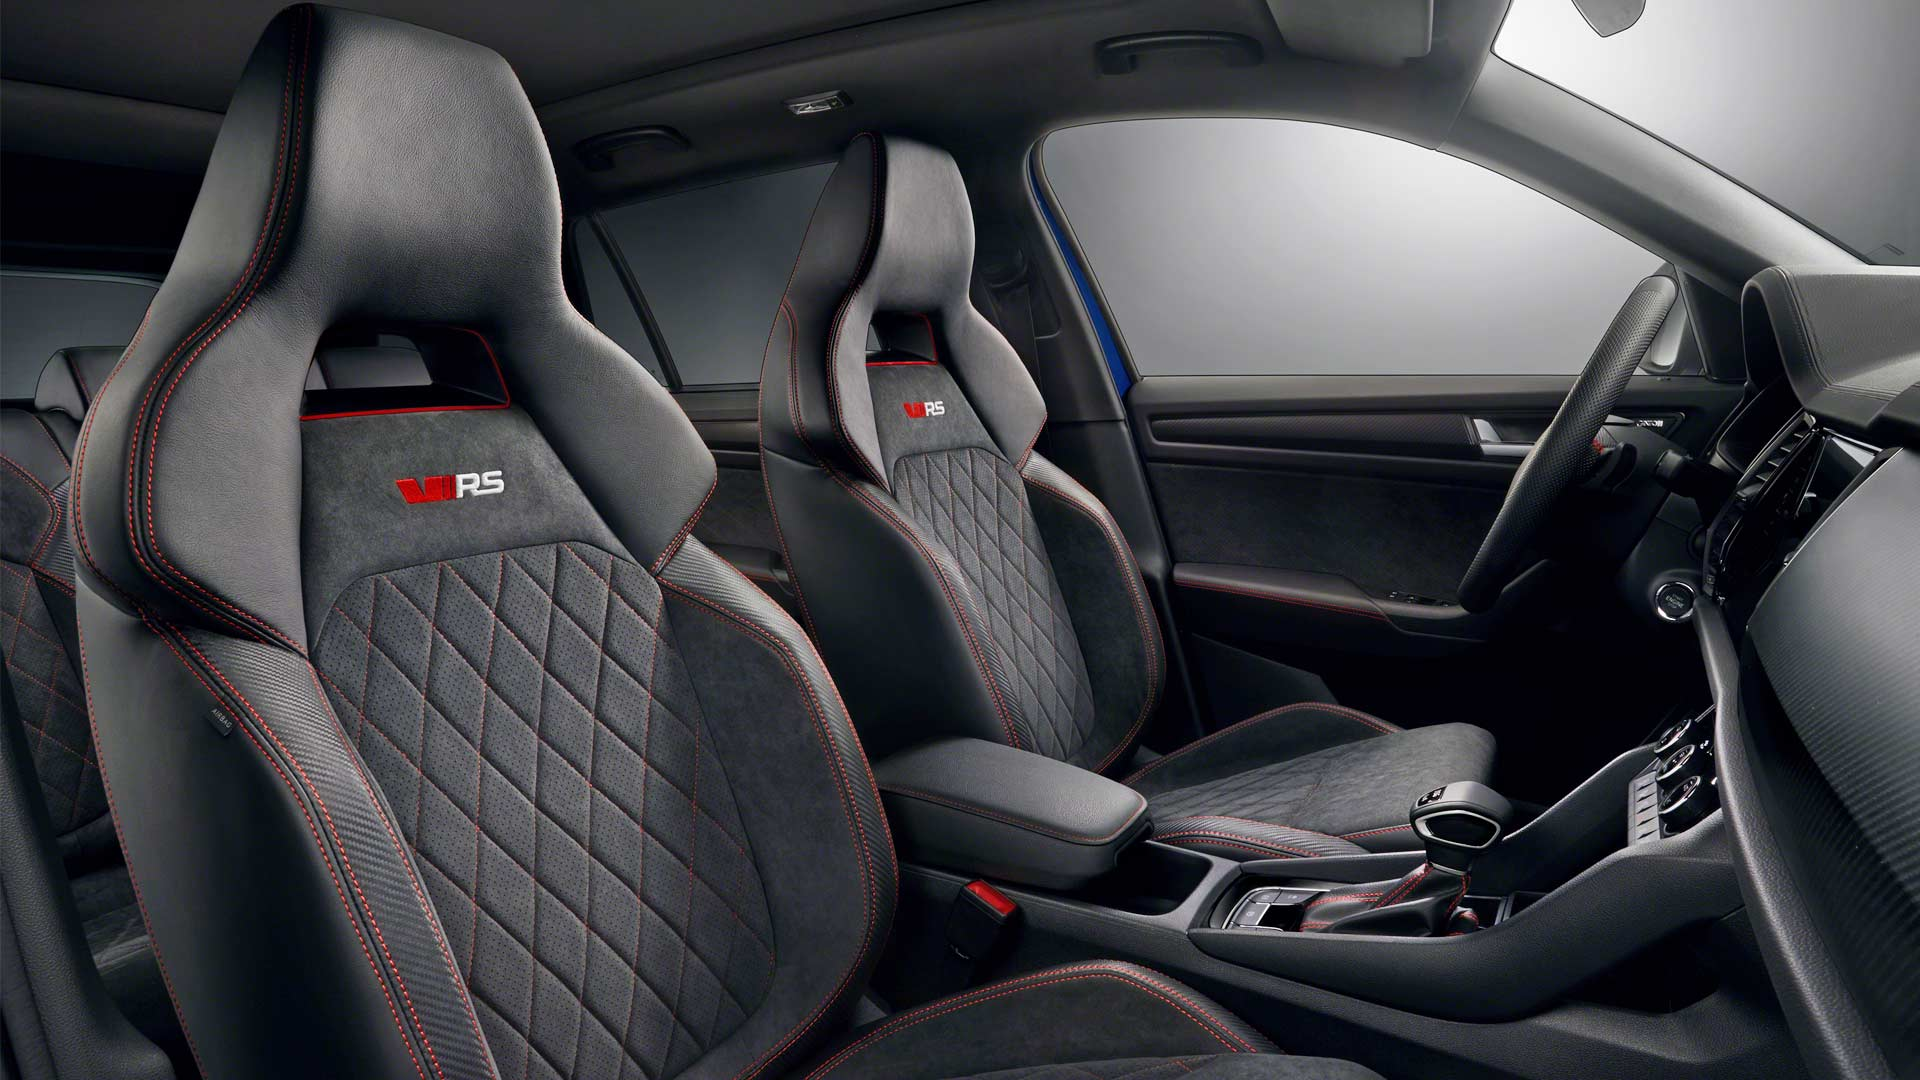 Skoda kodiaq rs shows its sporty interiors autodevot - Skoda kodiaq interior ...